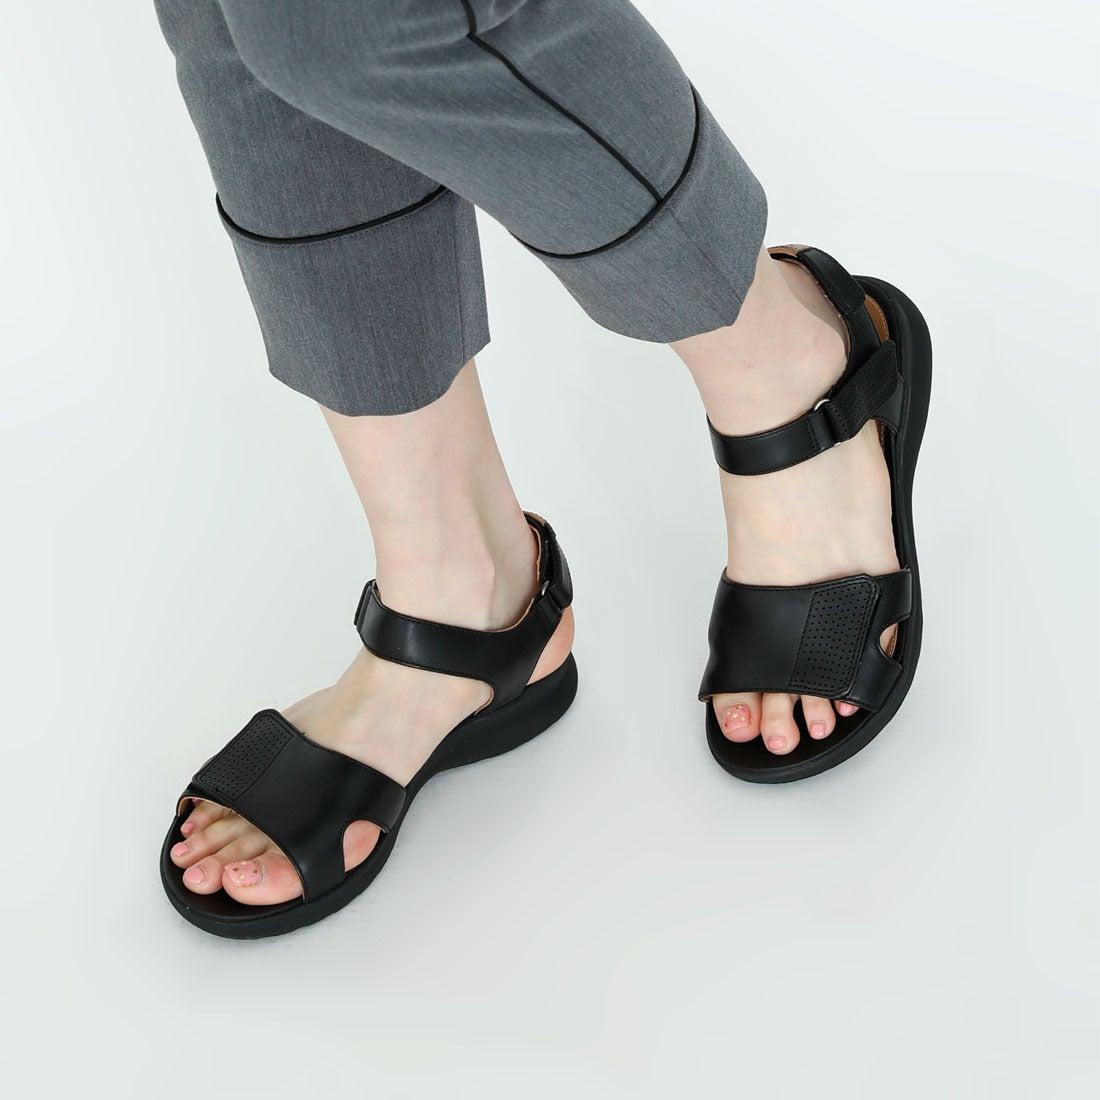 Clarks Un Adorn Calm Leather Sandals in Black